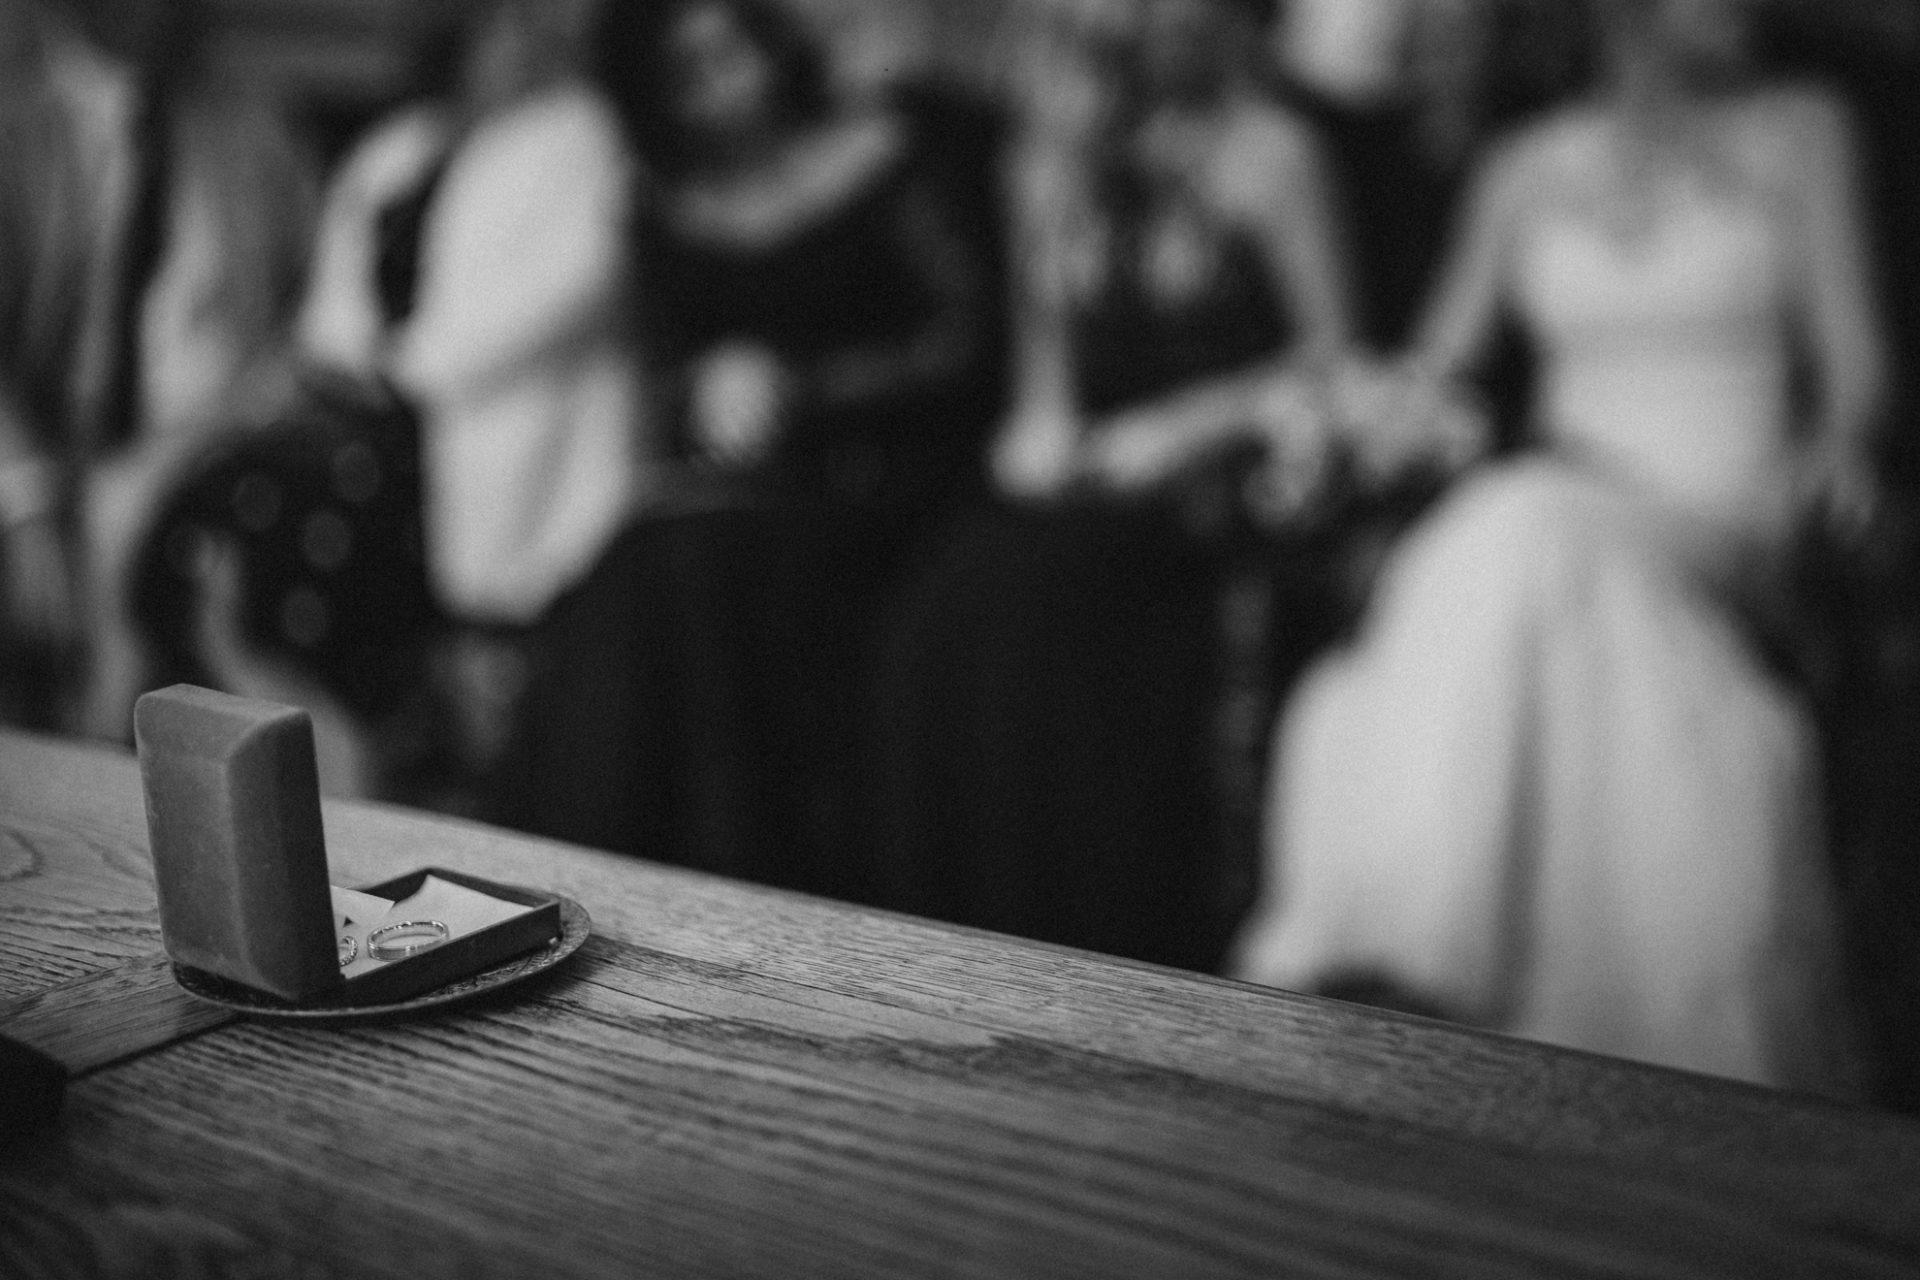 wedding rings details